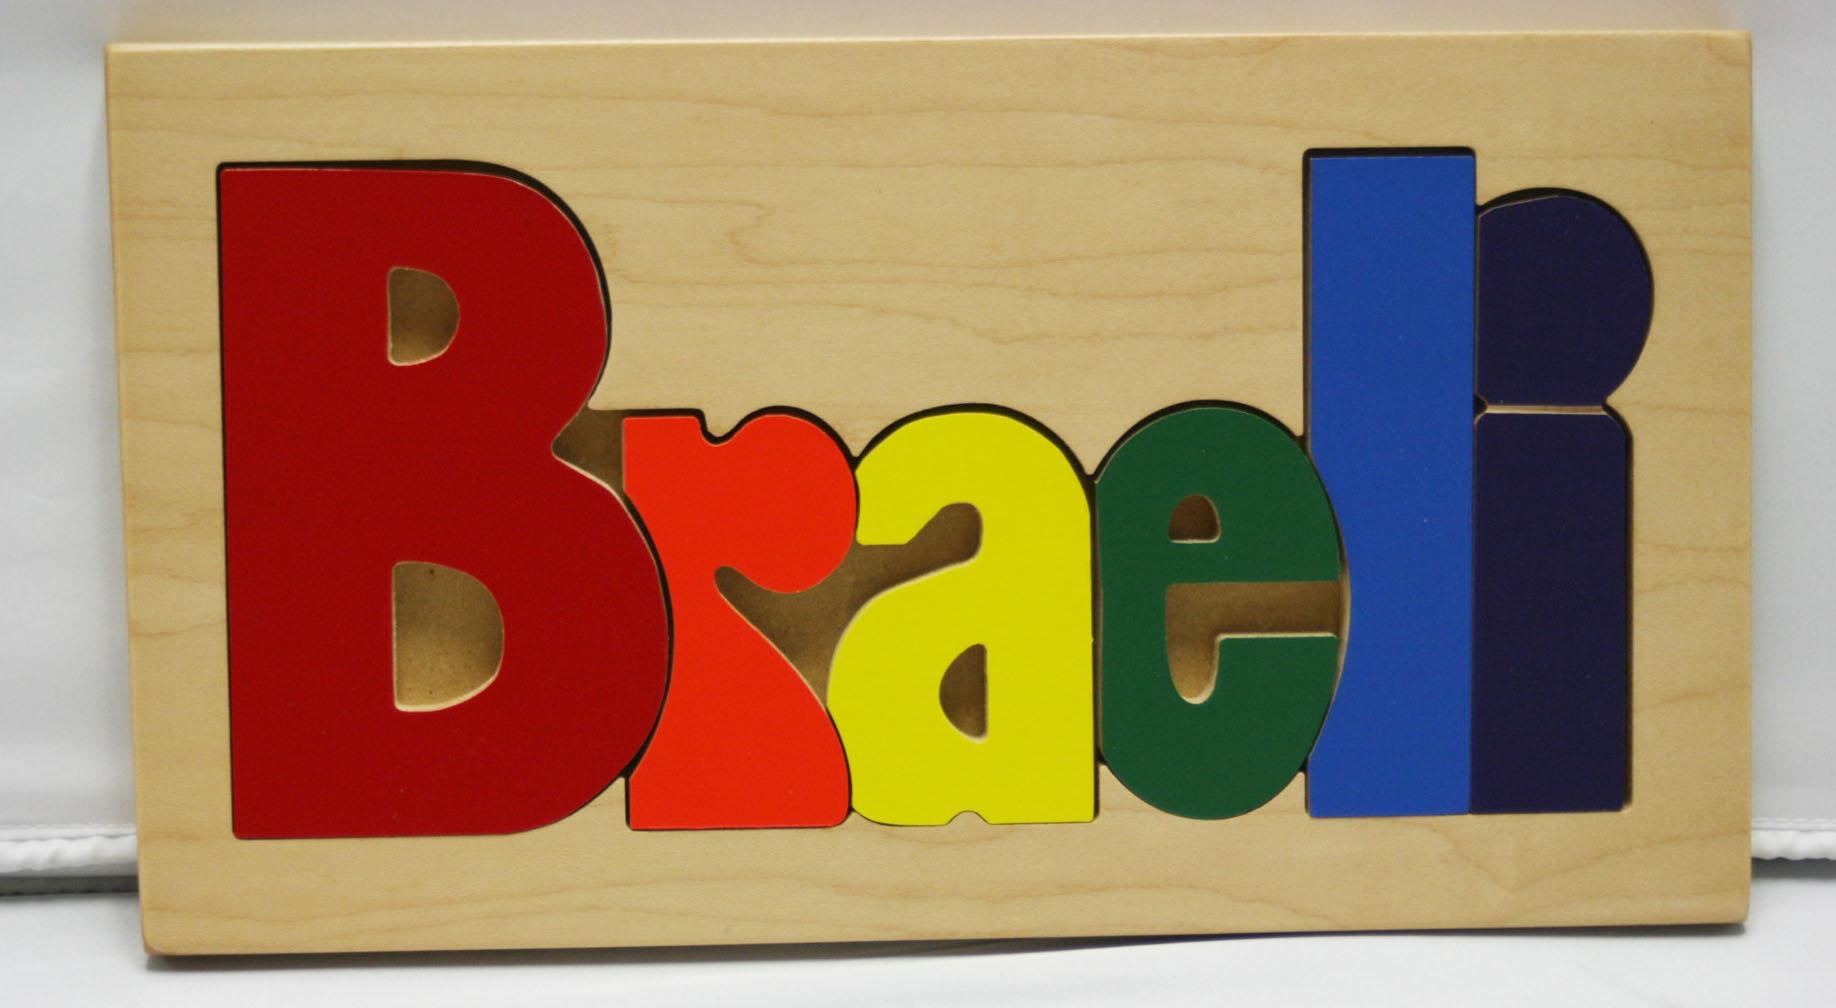 Braeli Wooden Name Puzzle